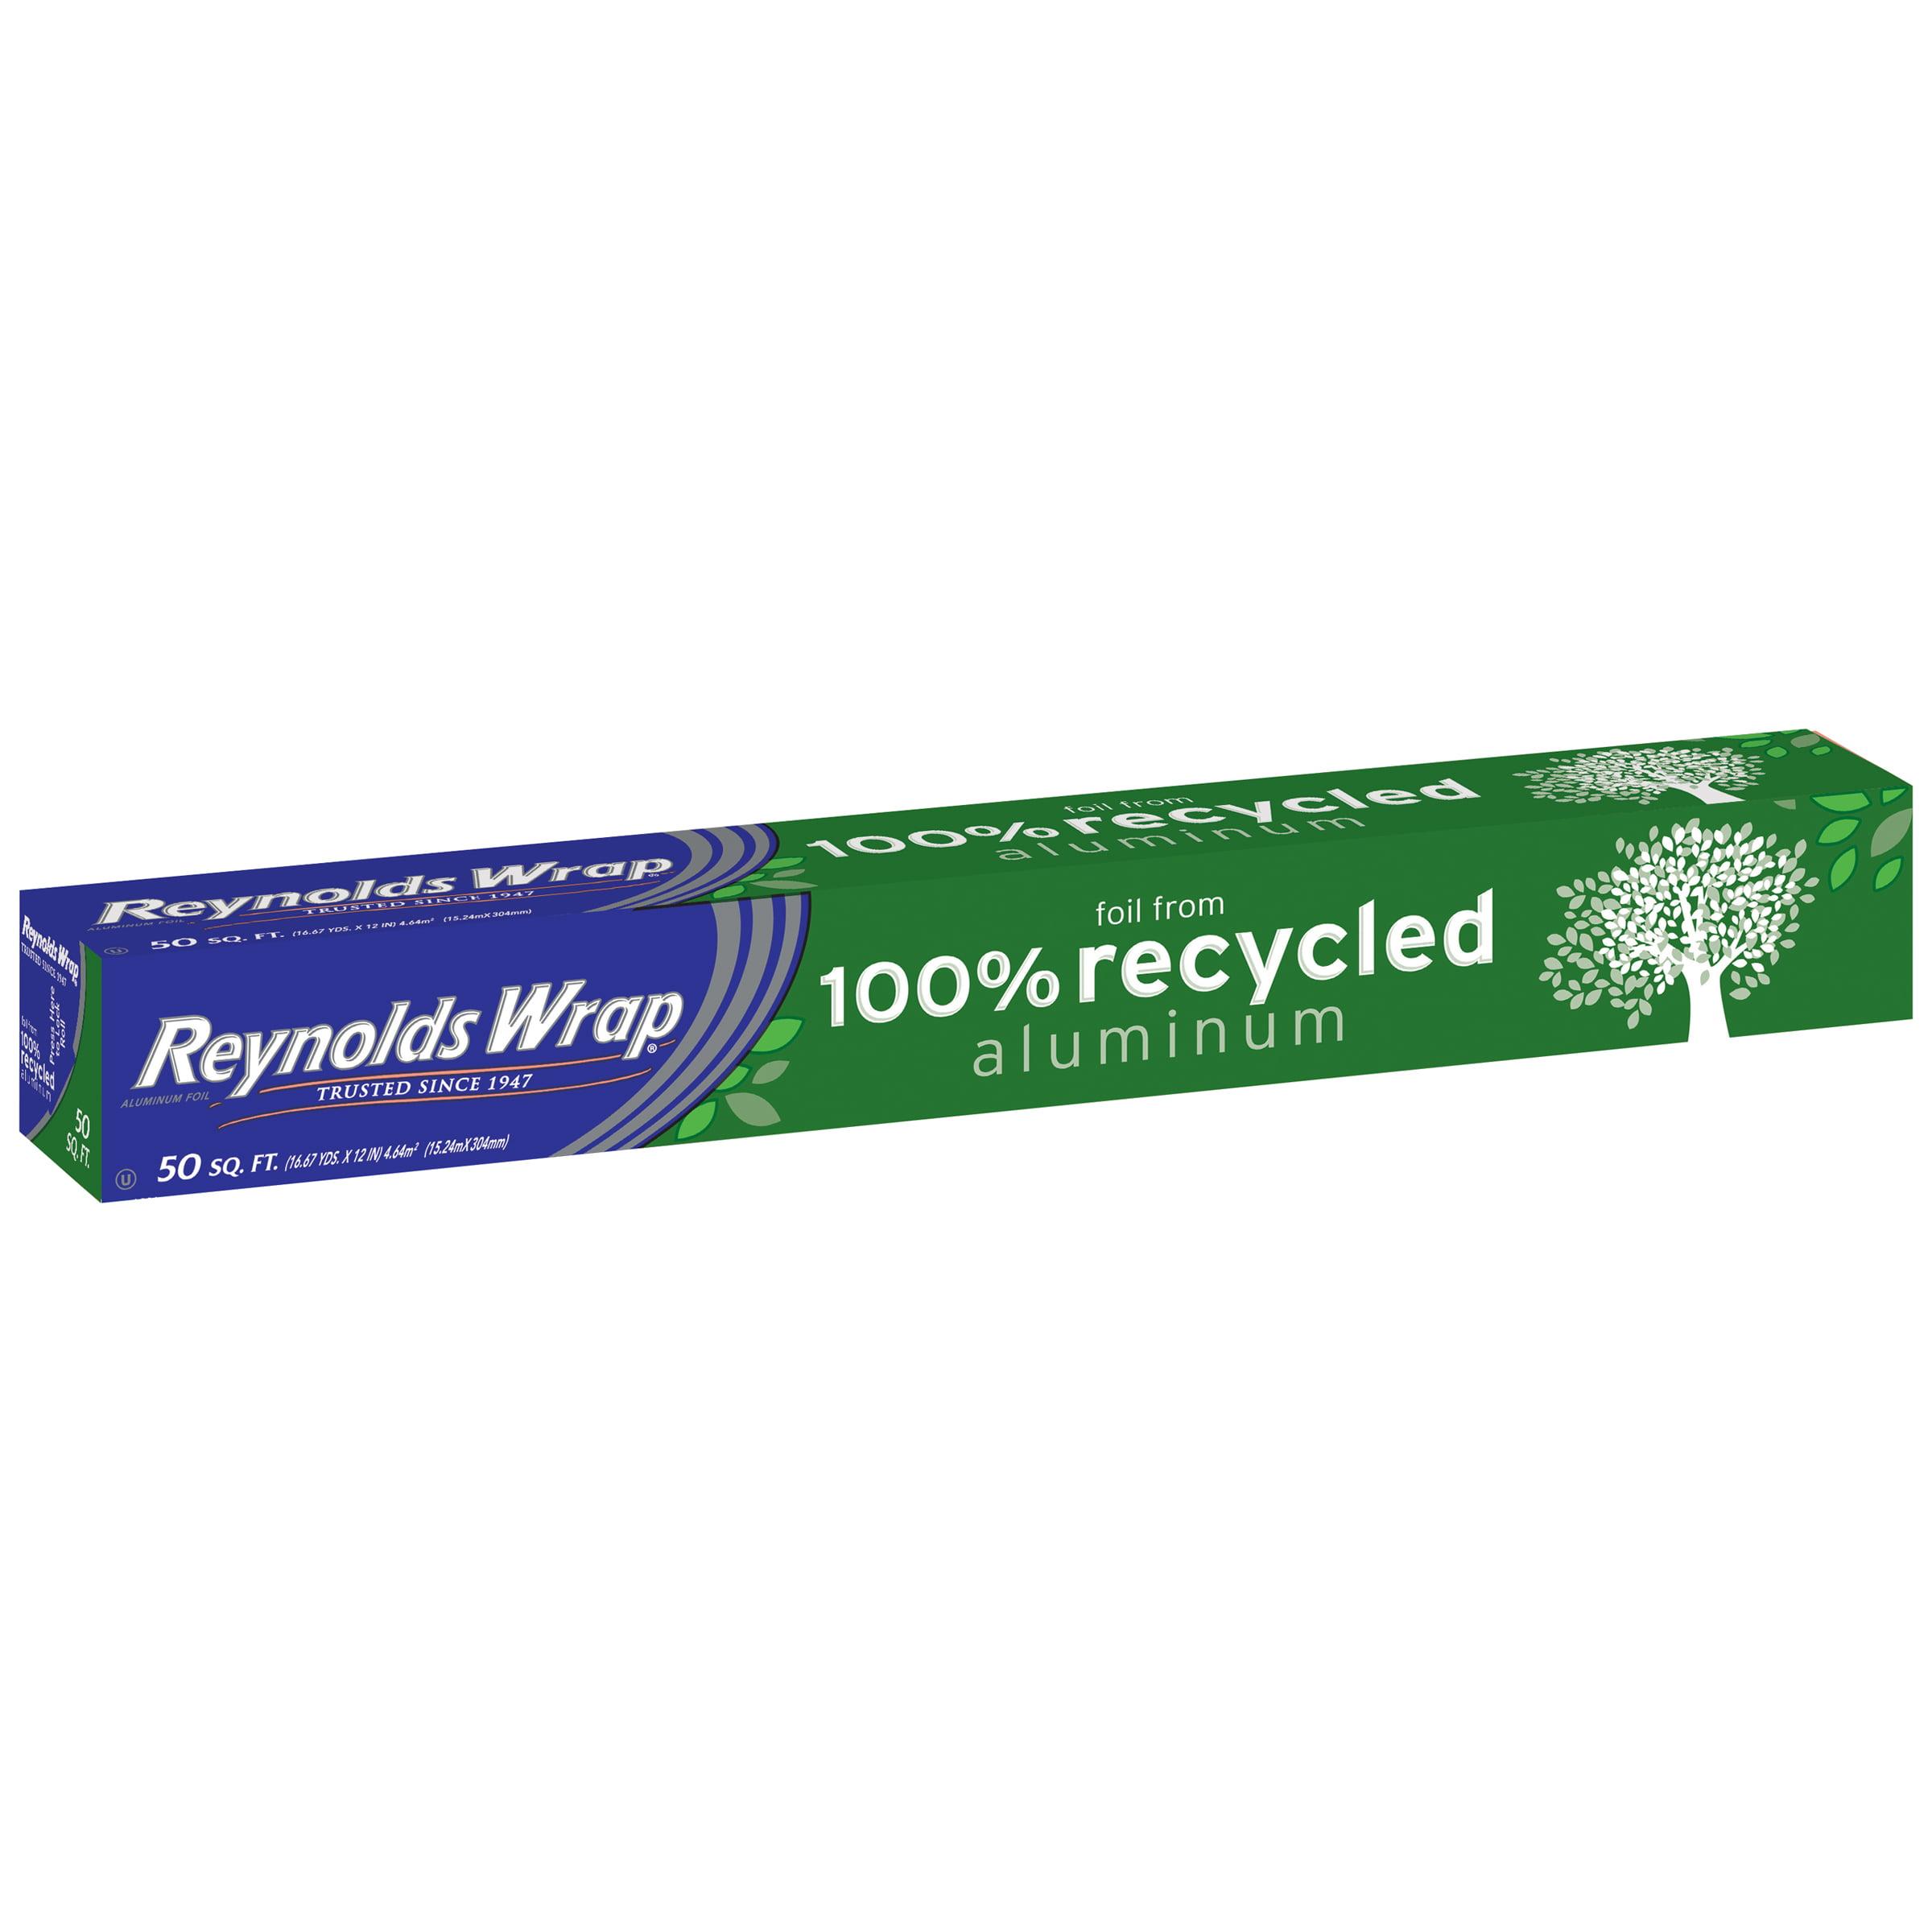 Reynolds Wrap® 100% Recycled Aluminum Foil 50 sq. ft. Box